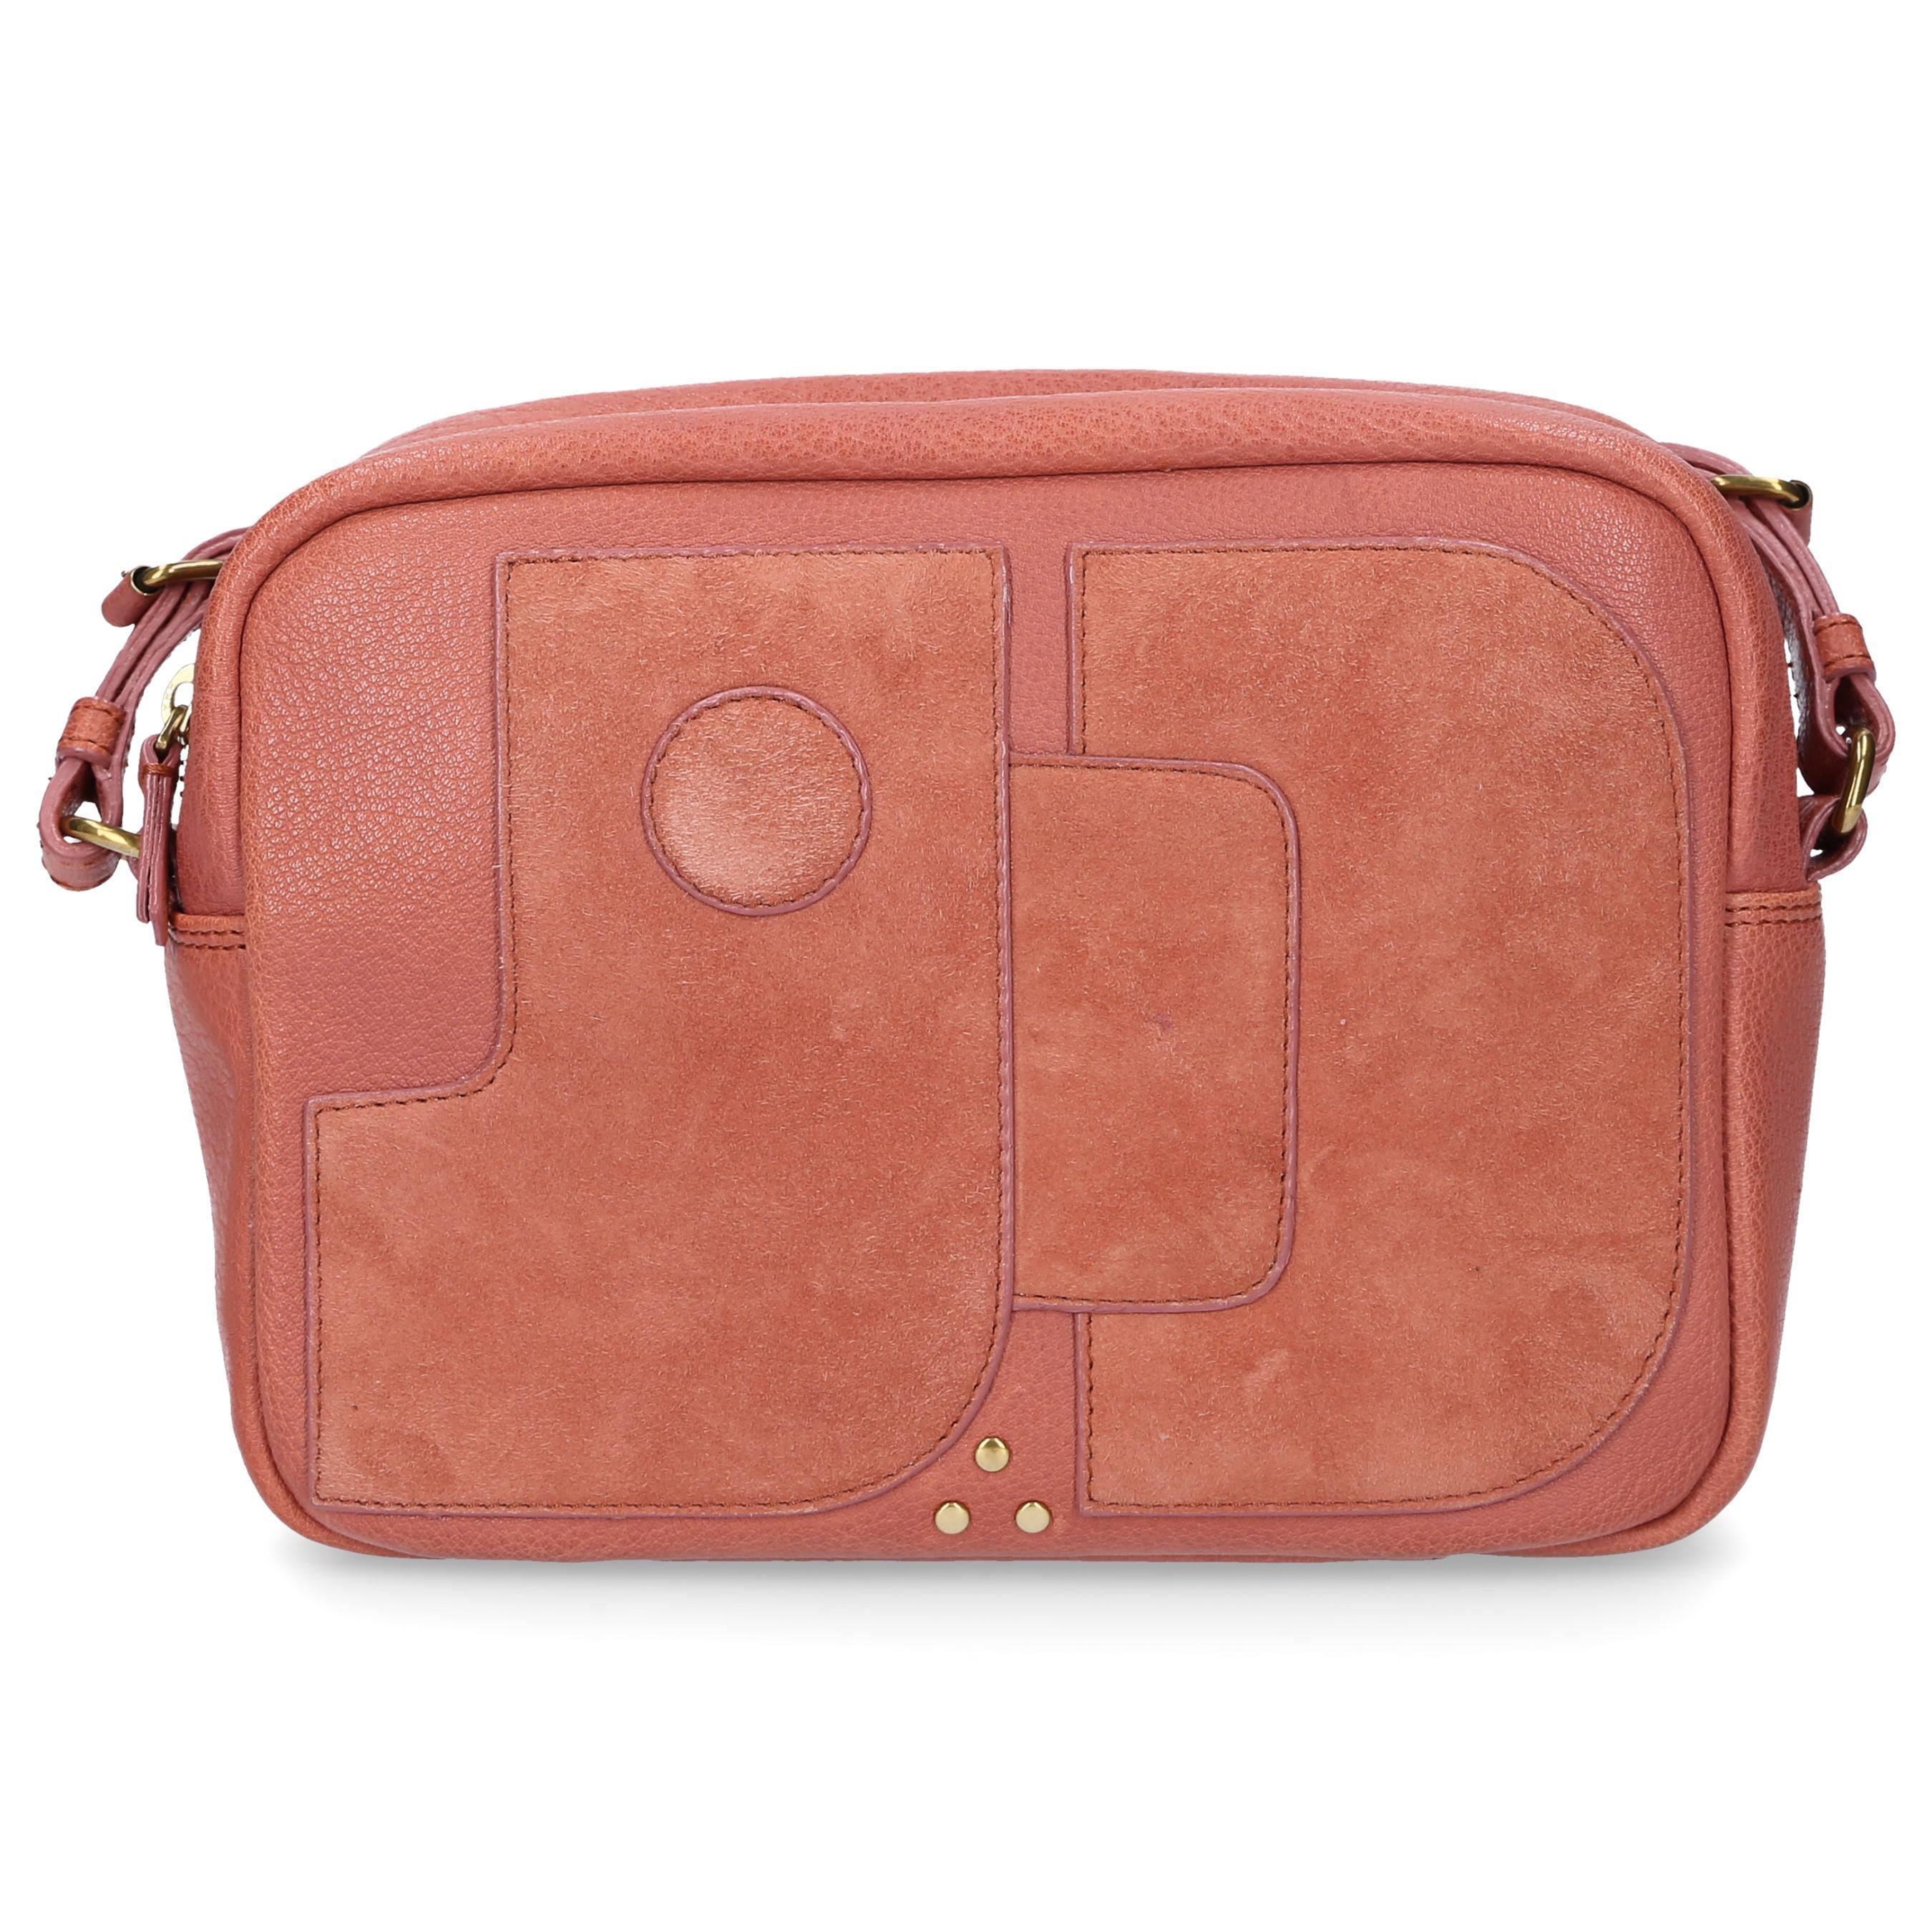 29ba9a800e Jérôme Dreyfuss Women Handbag Dominique Leather Logo Pink in Pink - Lyst